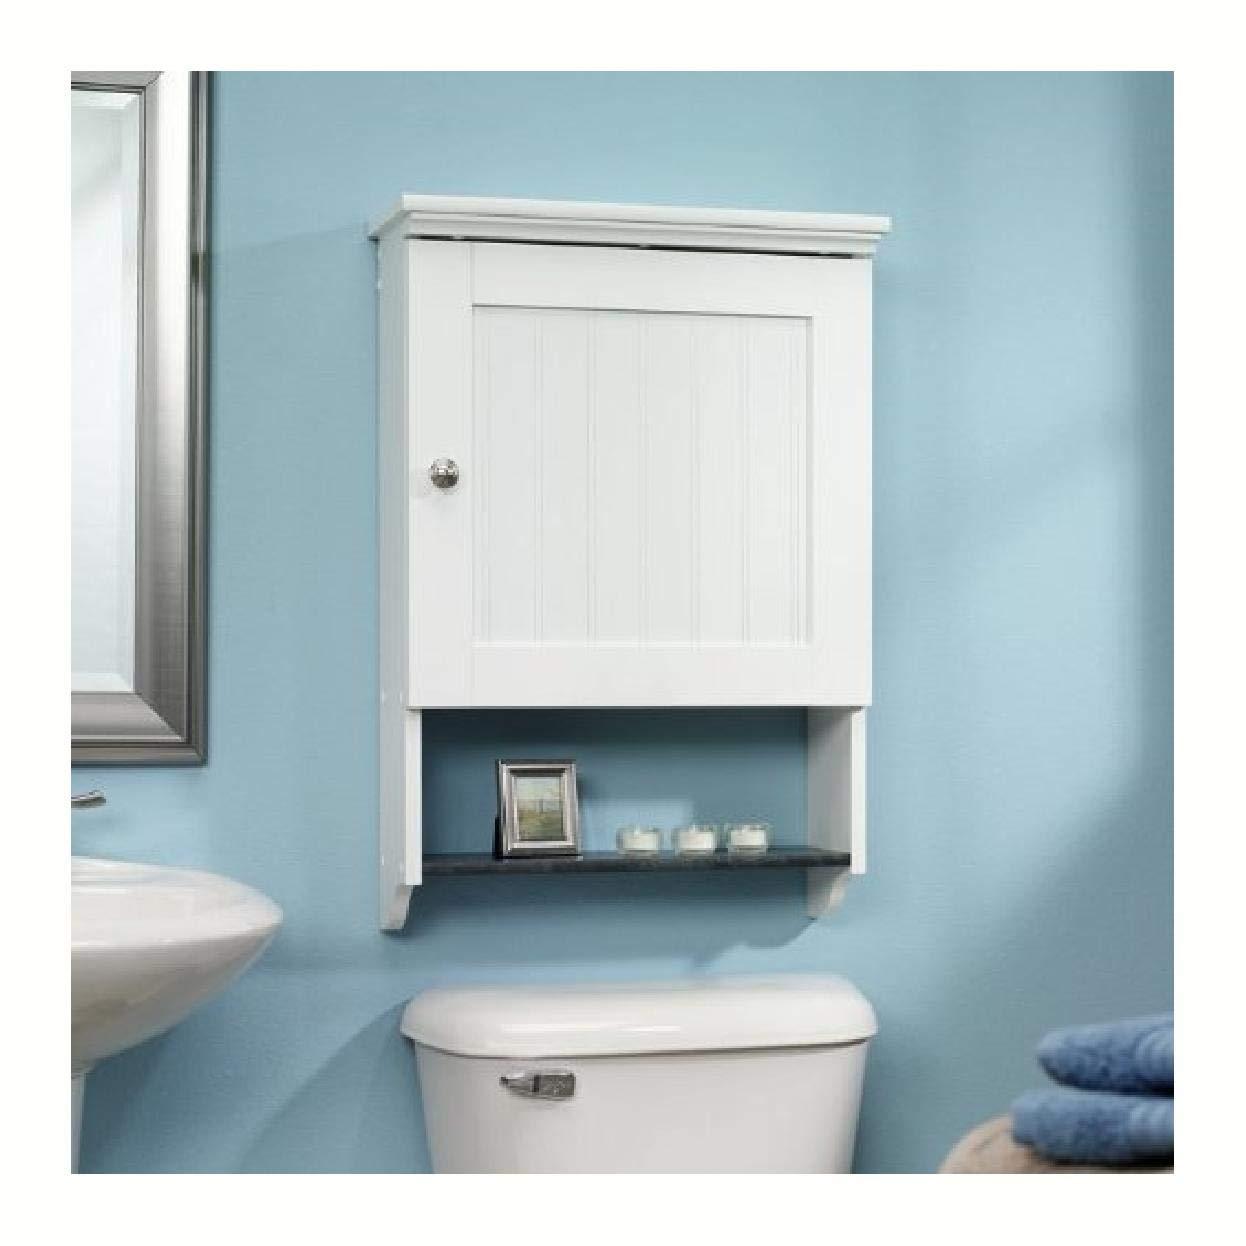 Bathroom Wall Cabin et in White Wood Fin ish with Bottom Storage Display Shelf, Bathroom Wall Cabinet in White Wood Finish with Bottom Storage Display Shelf by HomyDelight